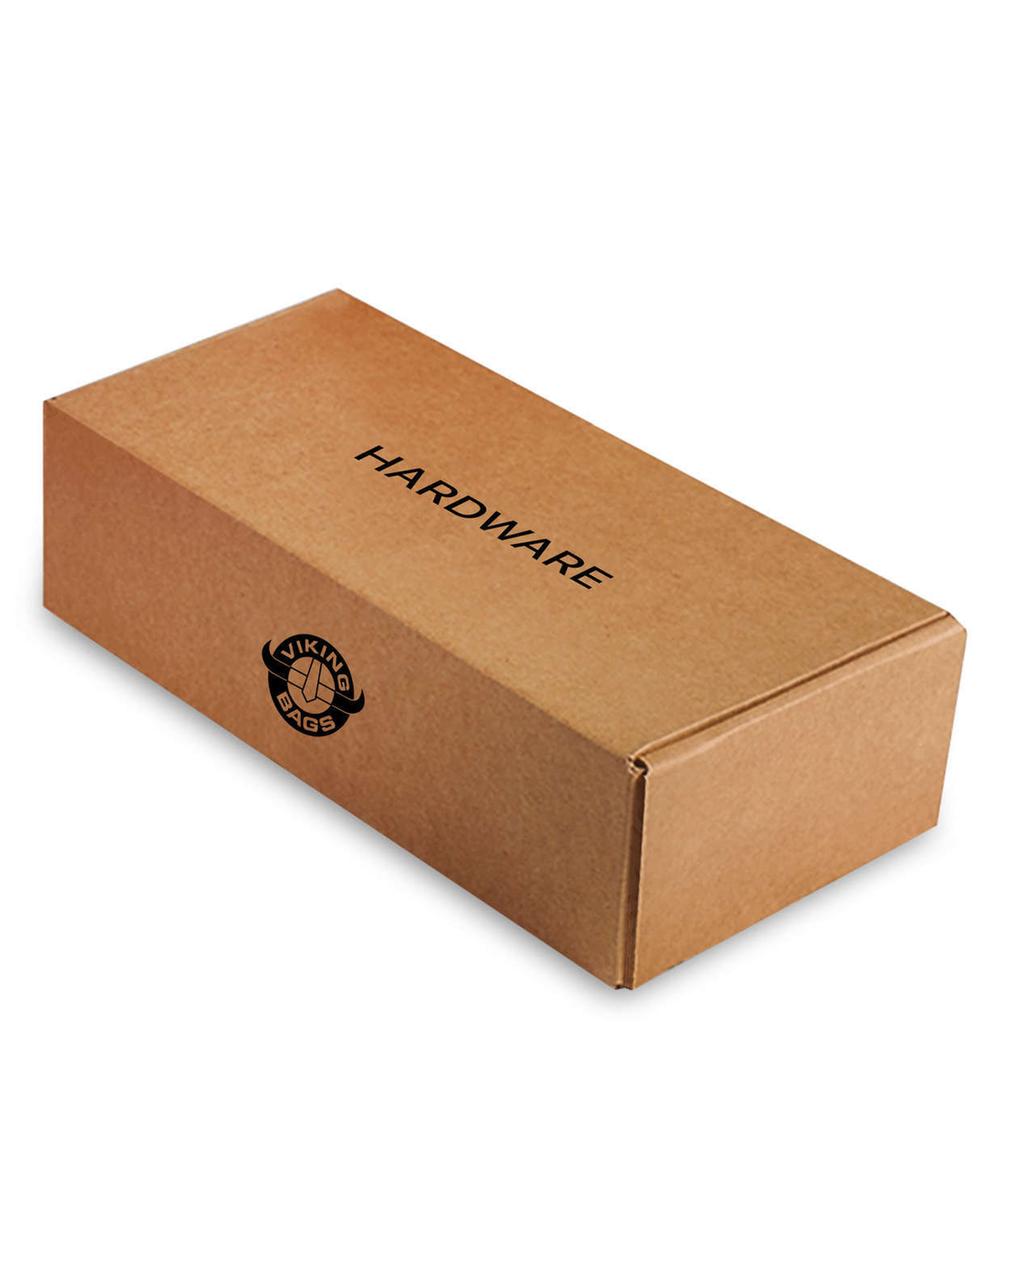 Triumph Rocket III Range Viking Lamellar Large Leather Covered Hard Saddlebags Box